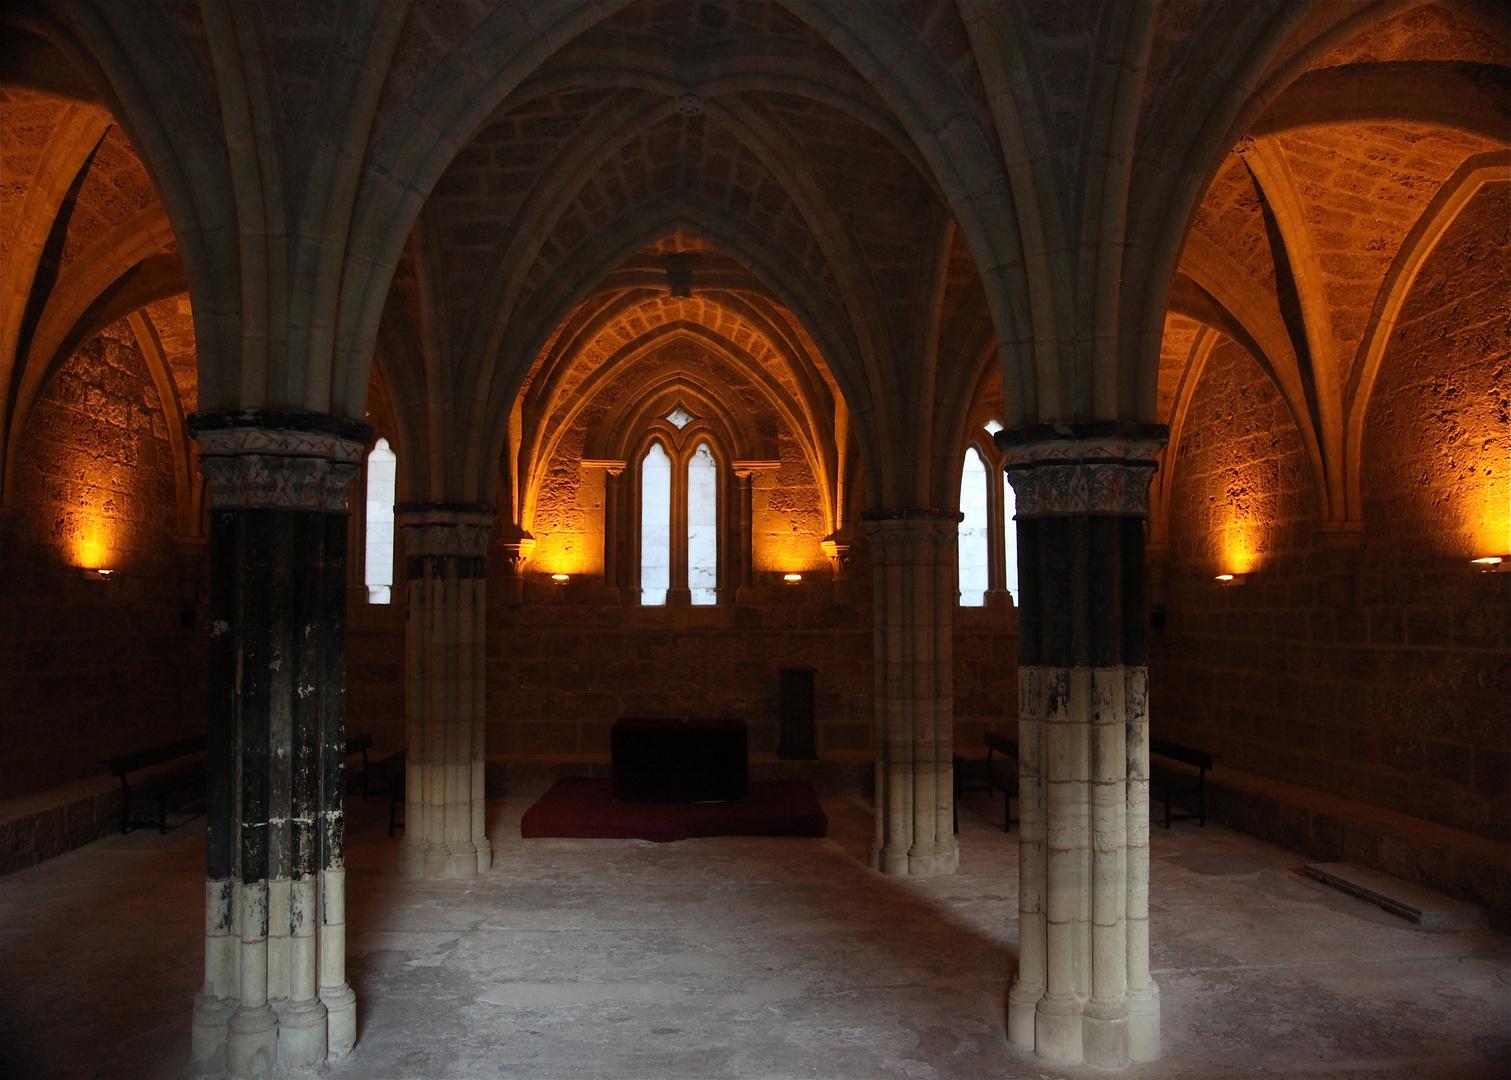 Monasterio de Piedra I